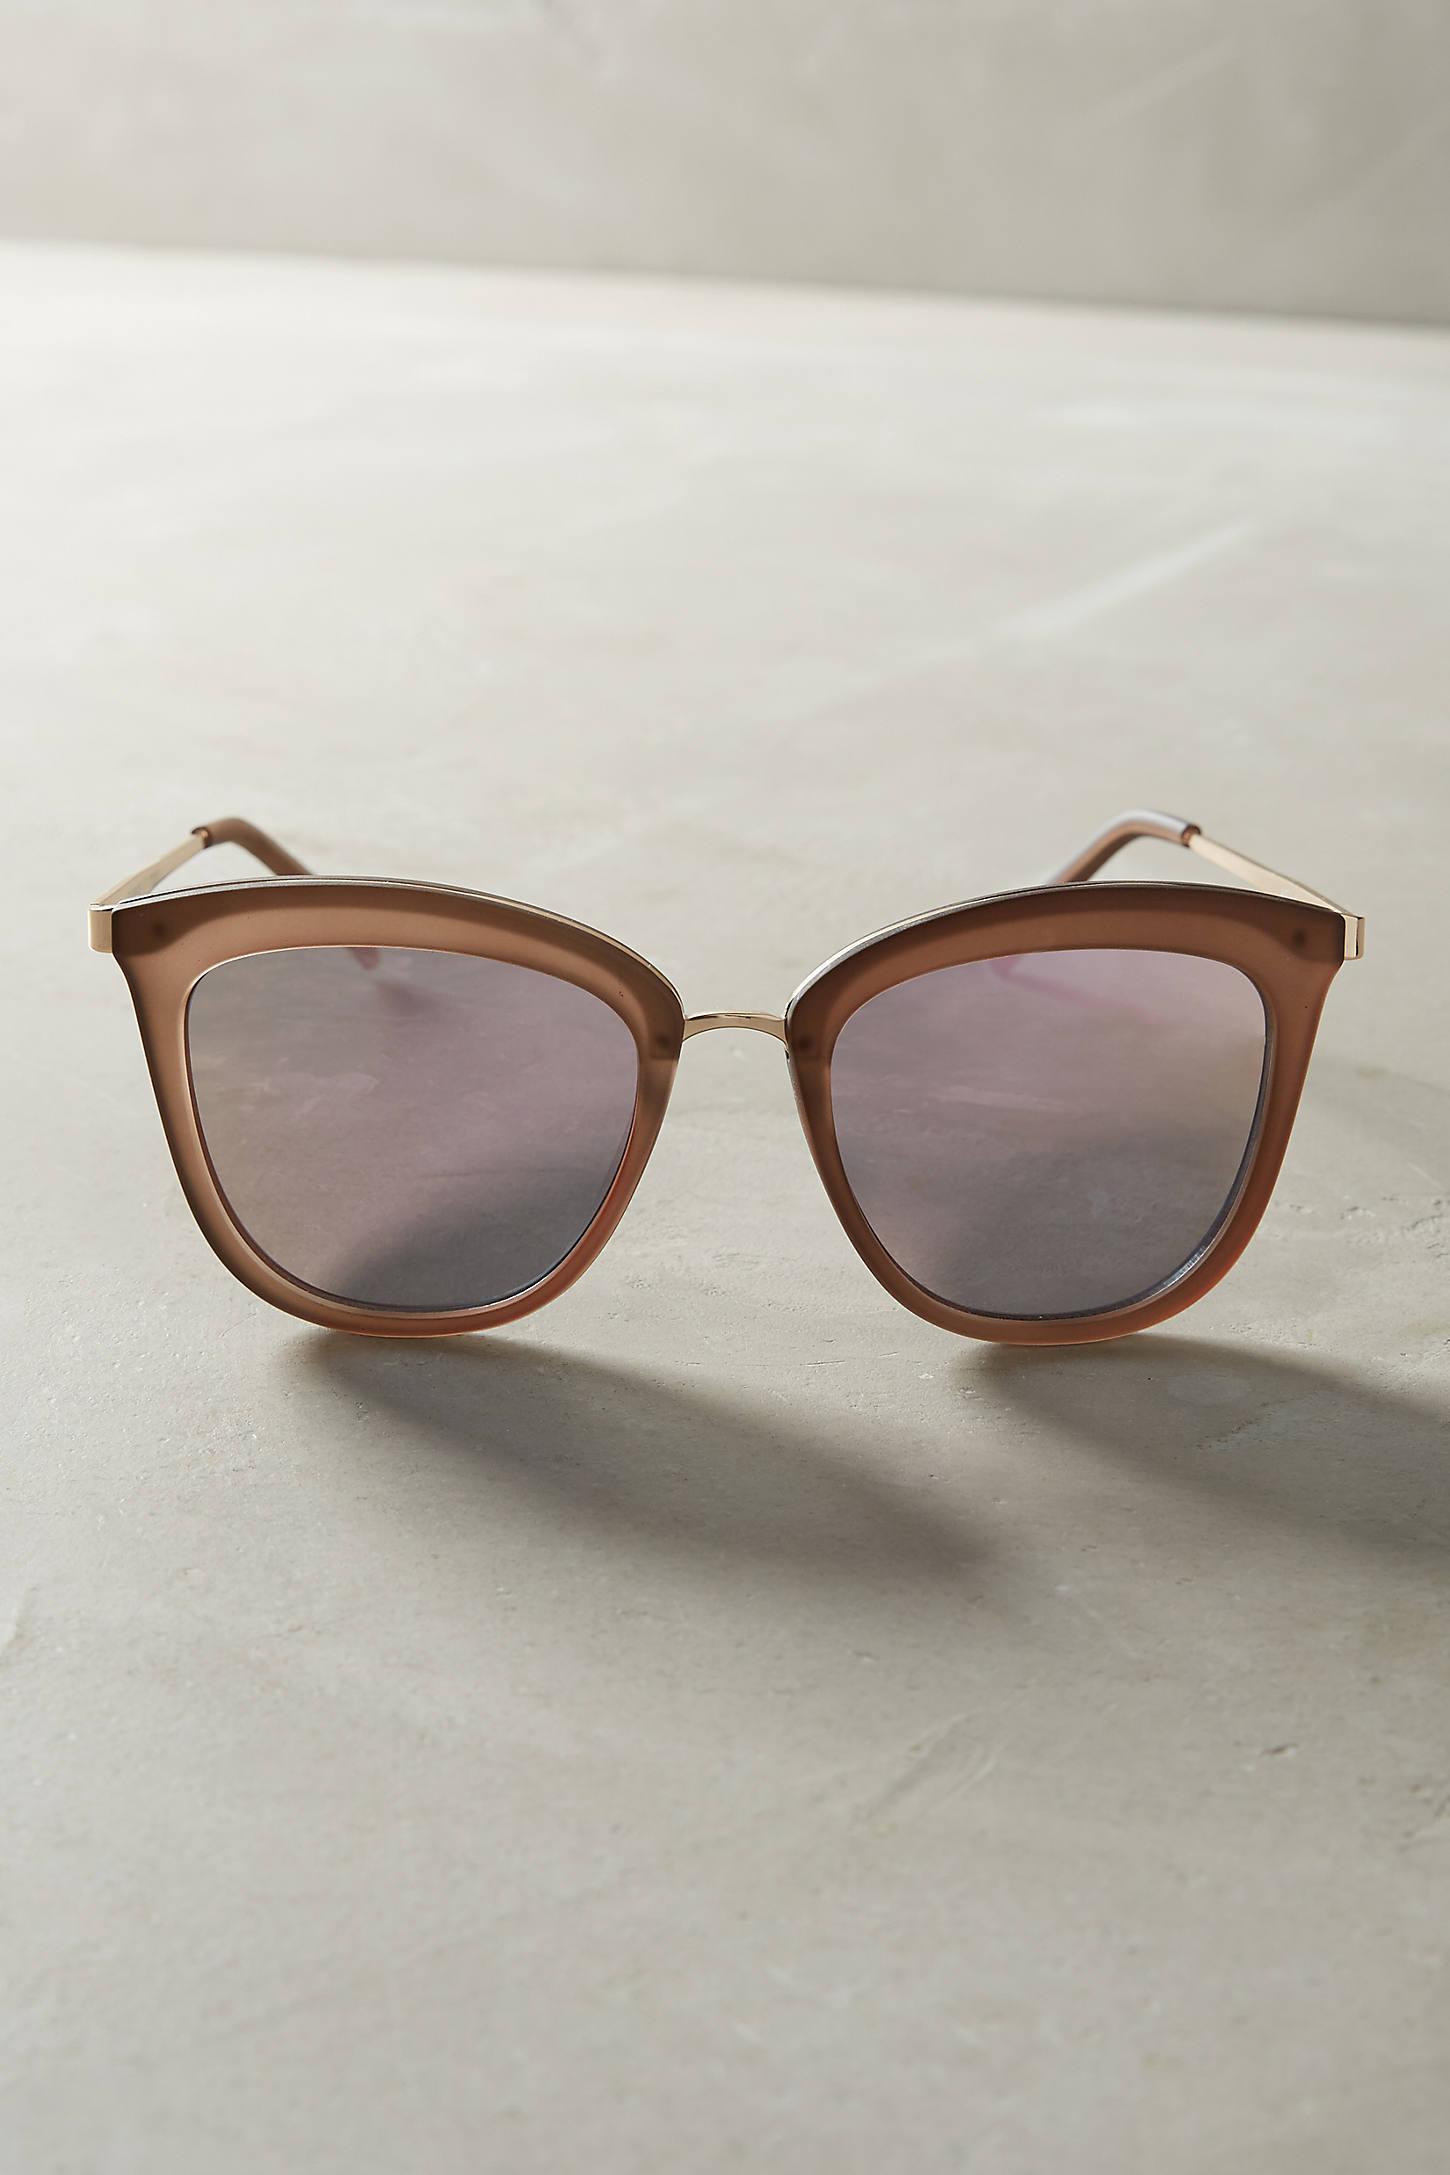 Le Specs Caliente Mirrored Sunglasses